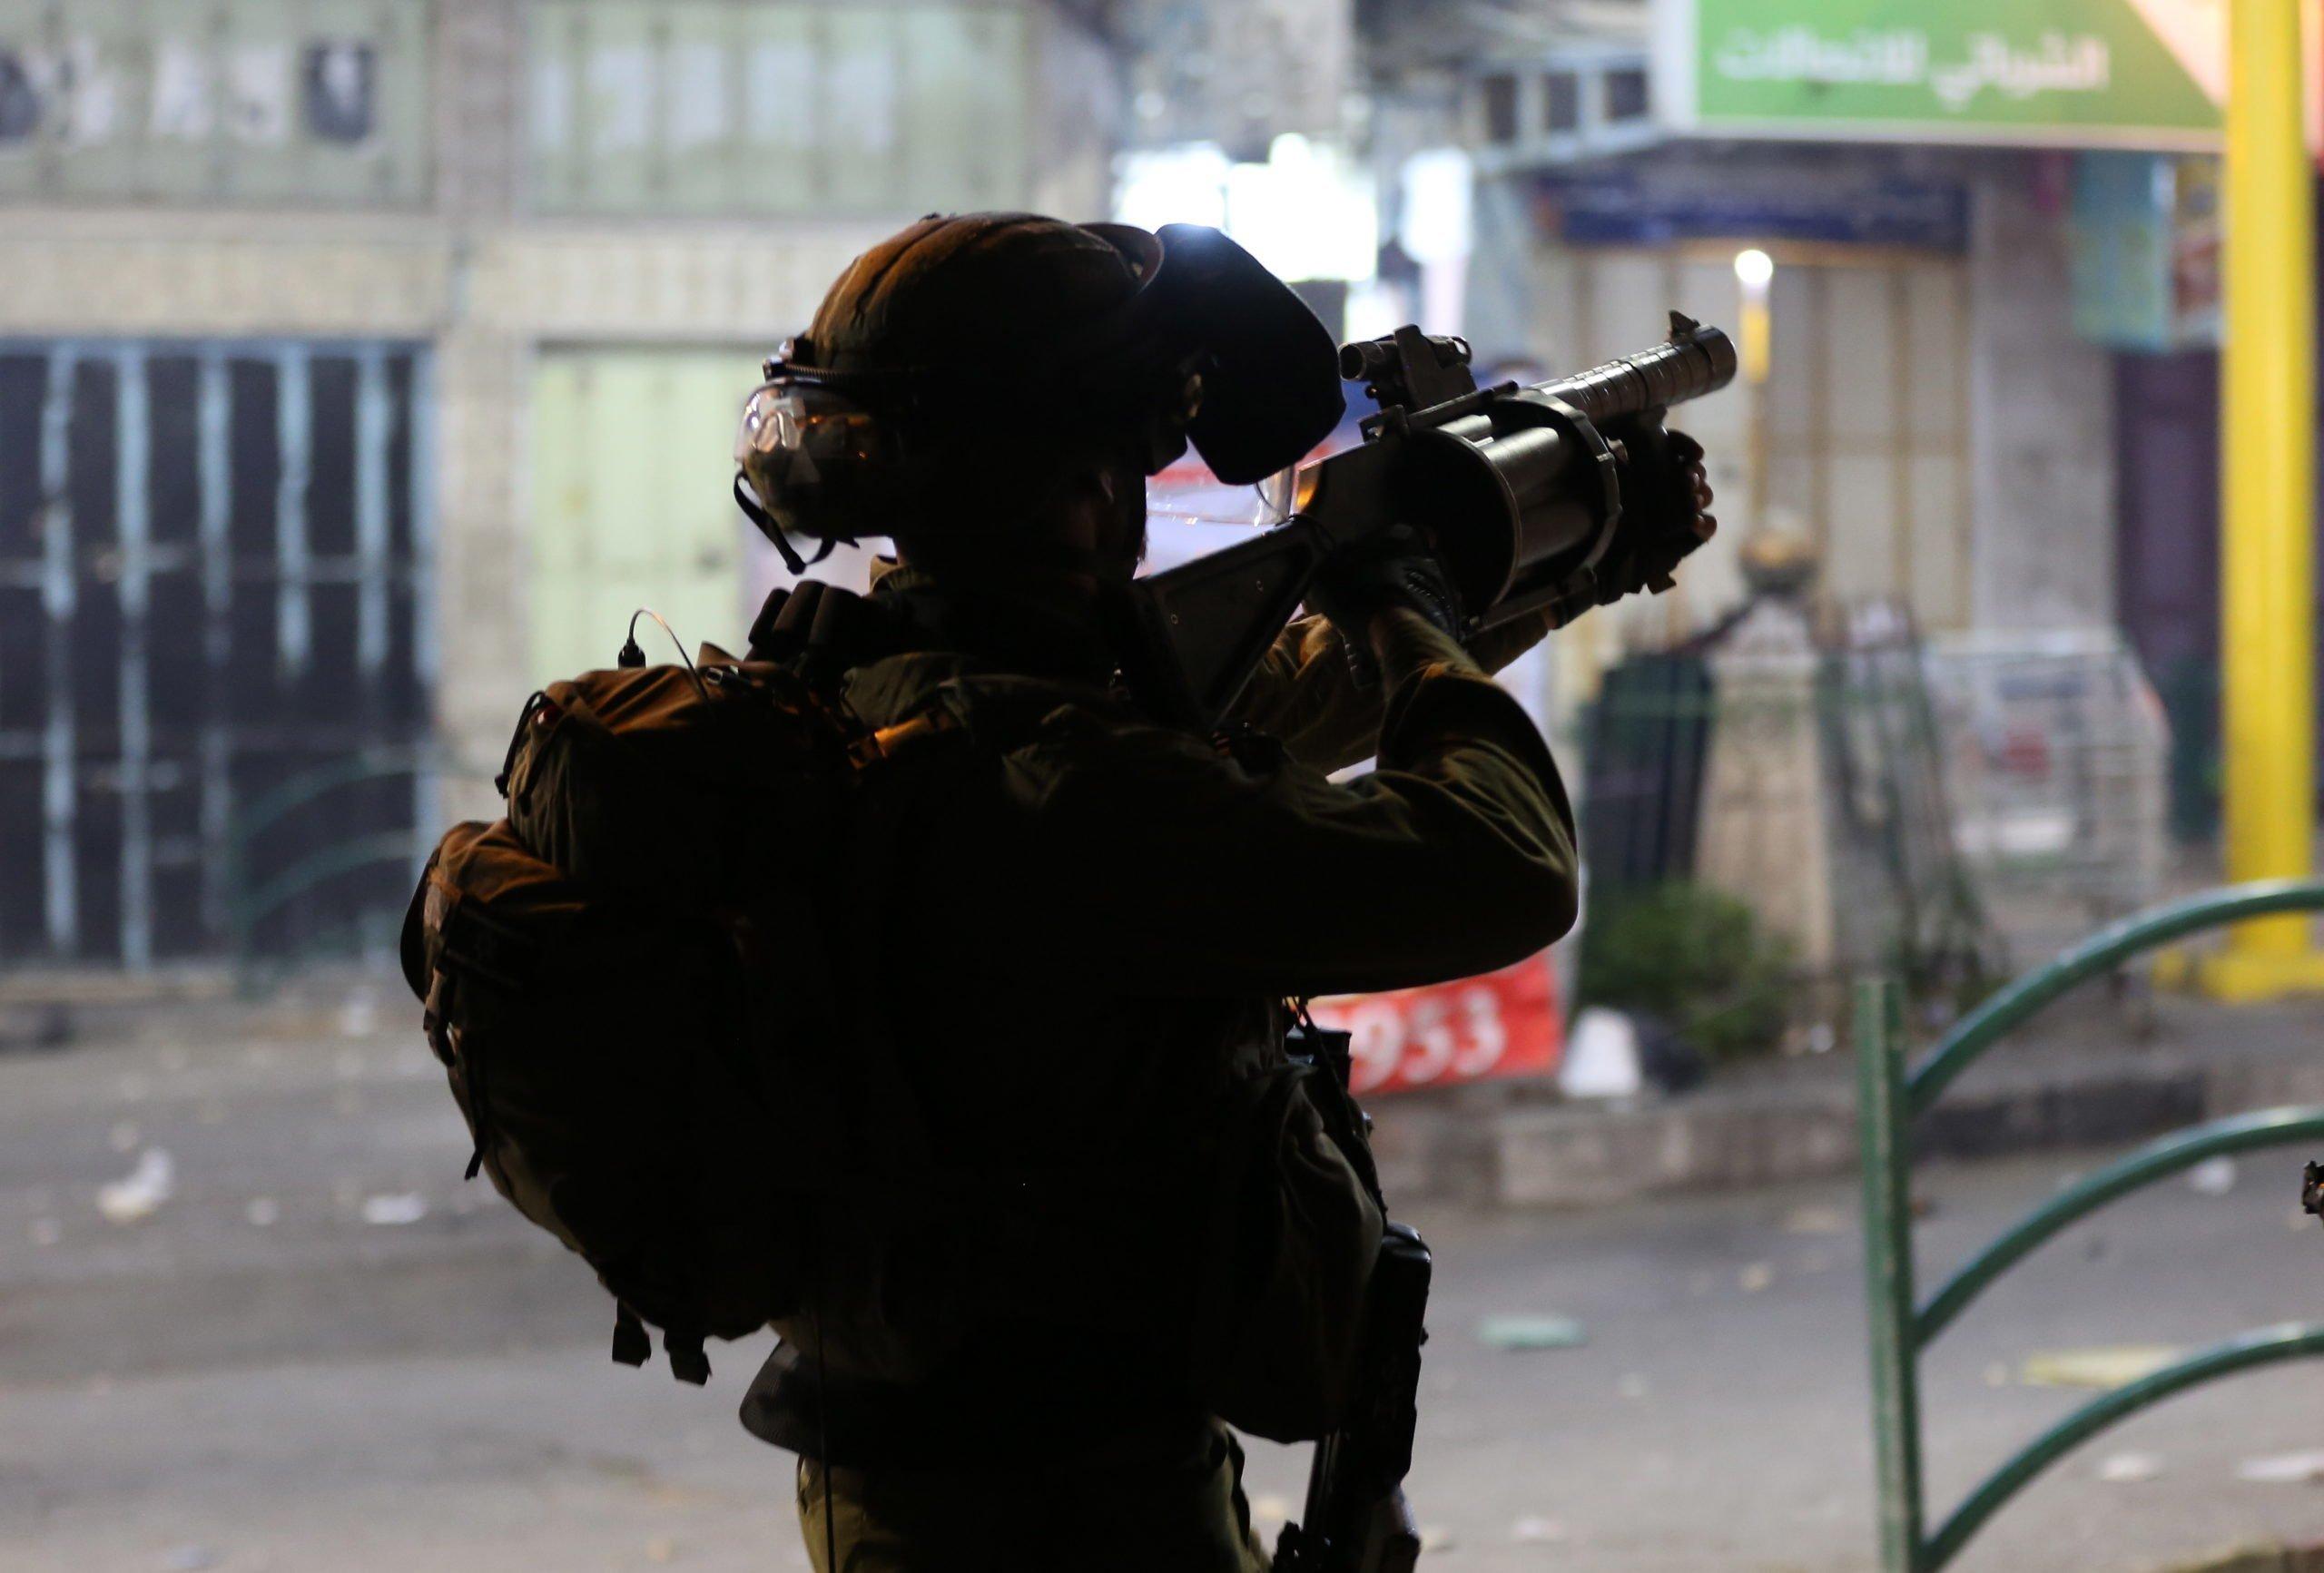 Ierousalim Palestine Israel 4 Scaled